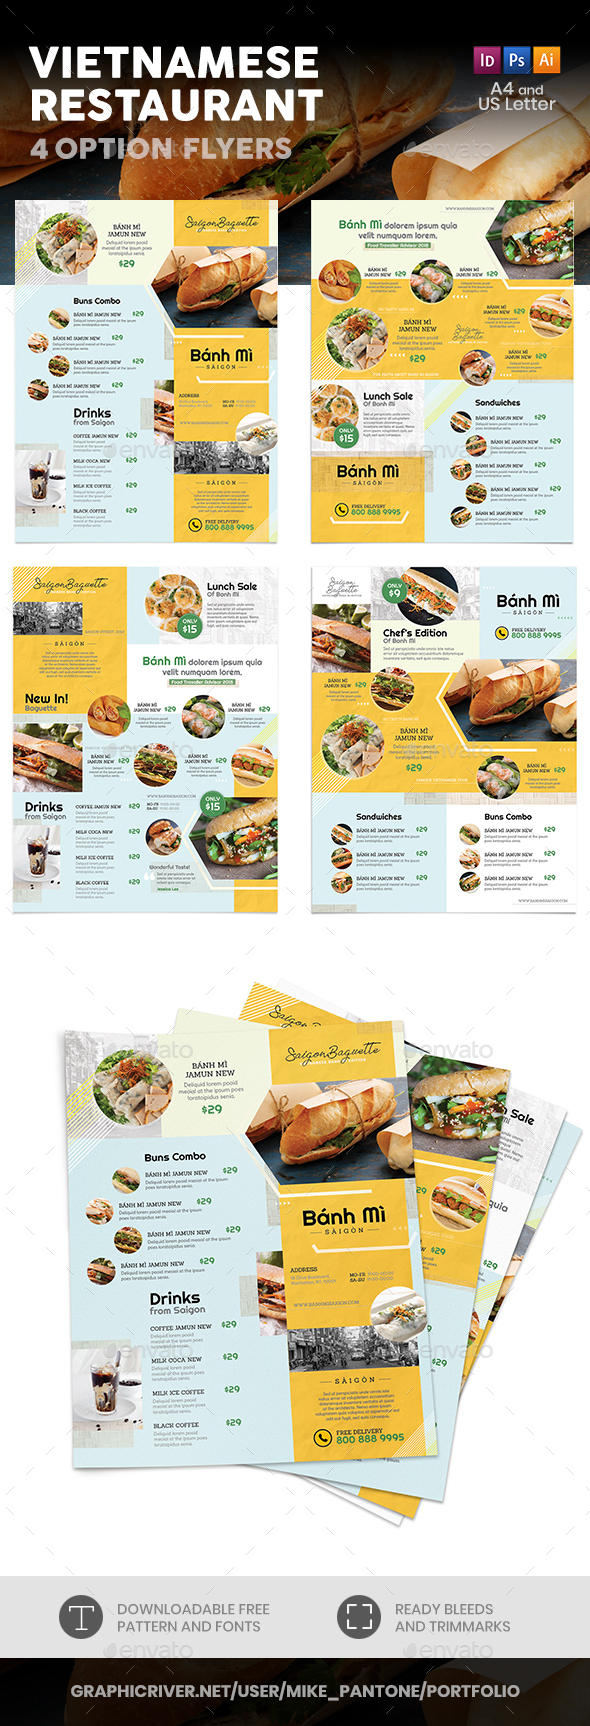 Vietnamese Restaurant Menu Flyers 4 – 4 Options